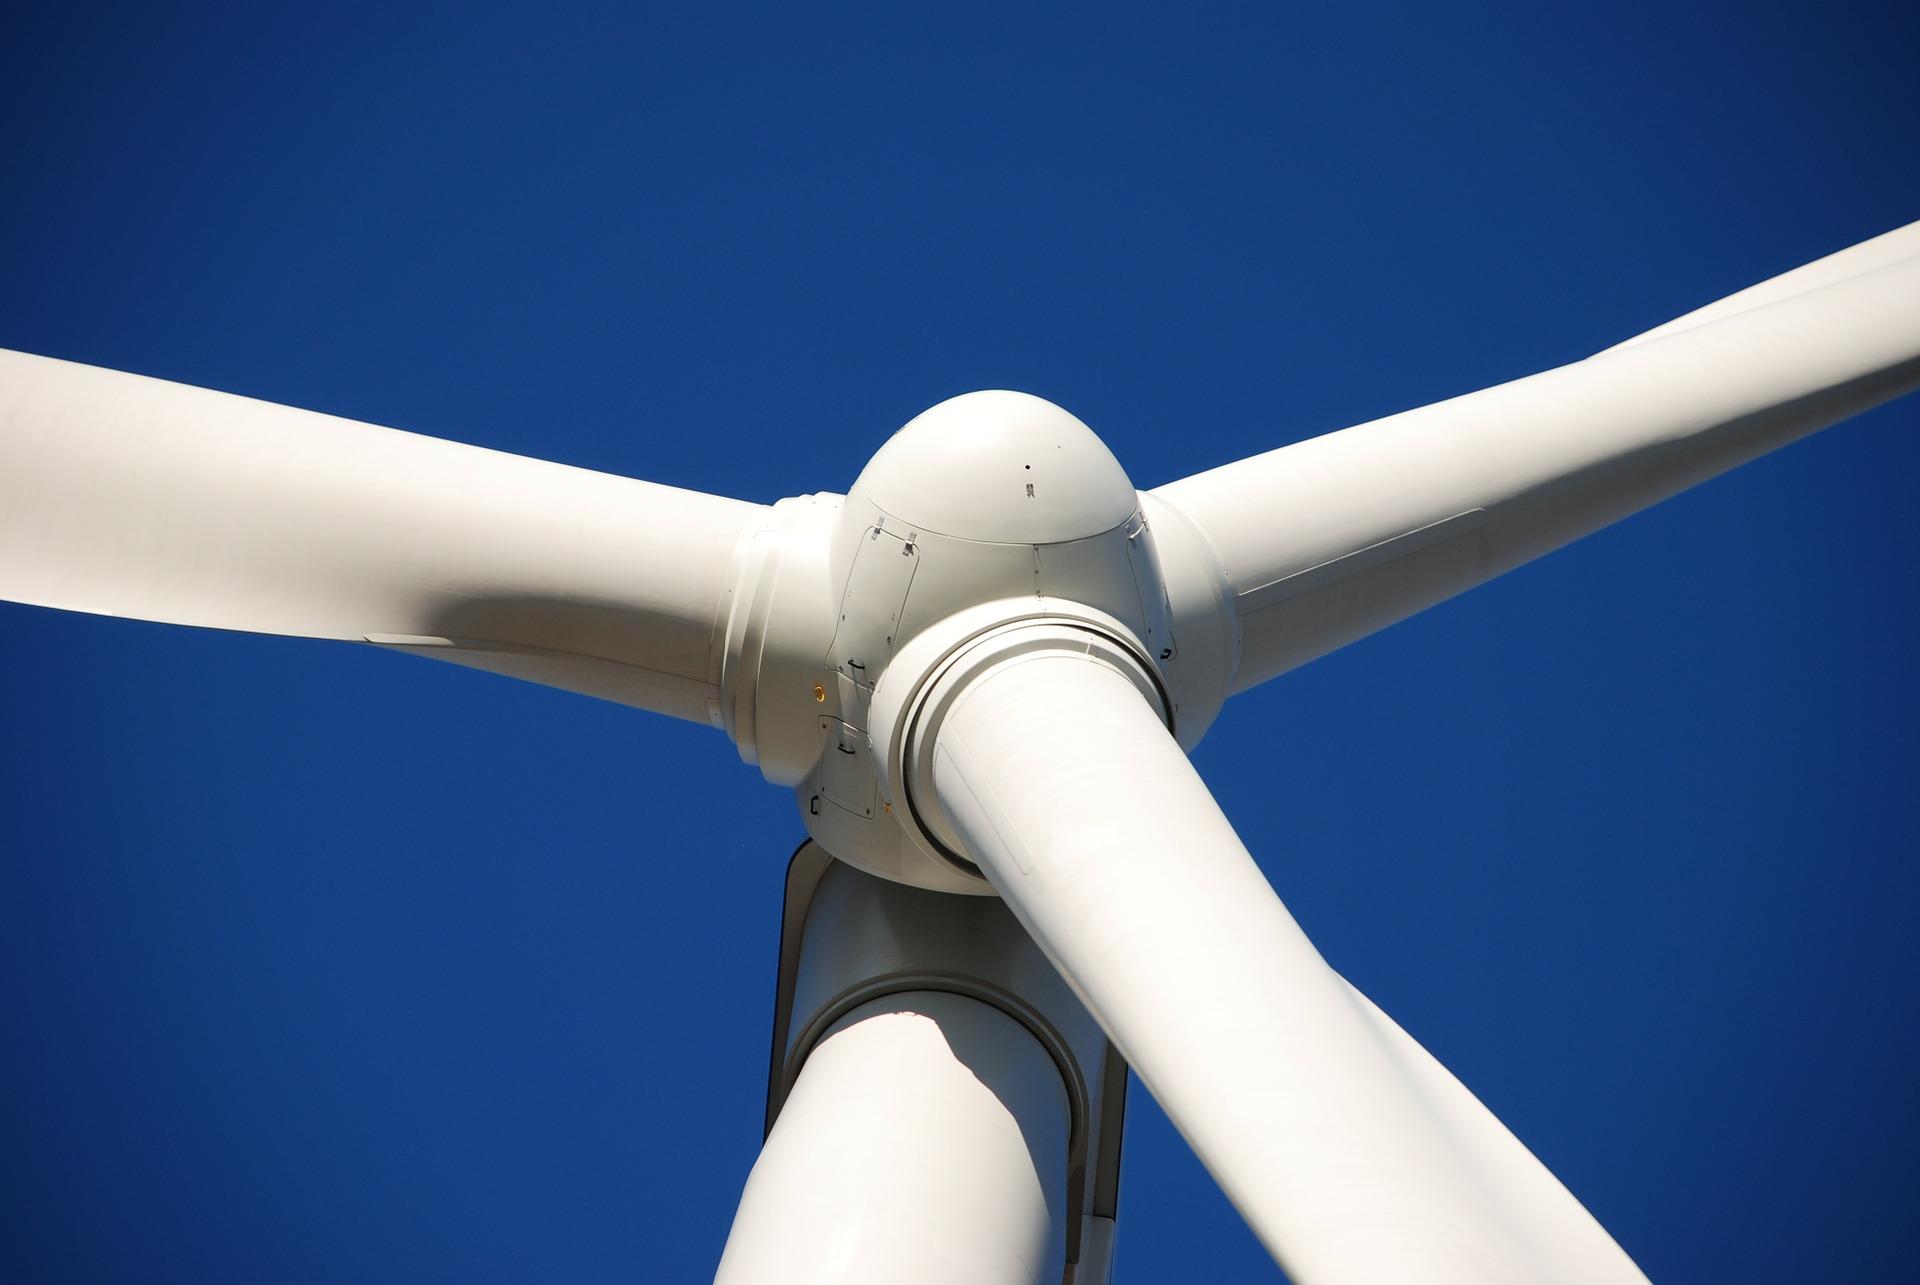 Wind turbine recycling equipment